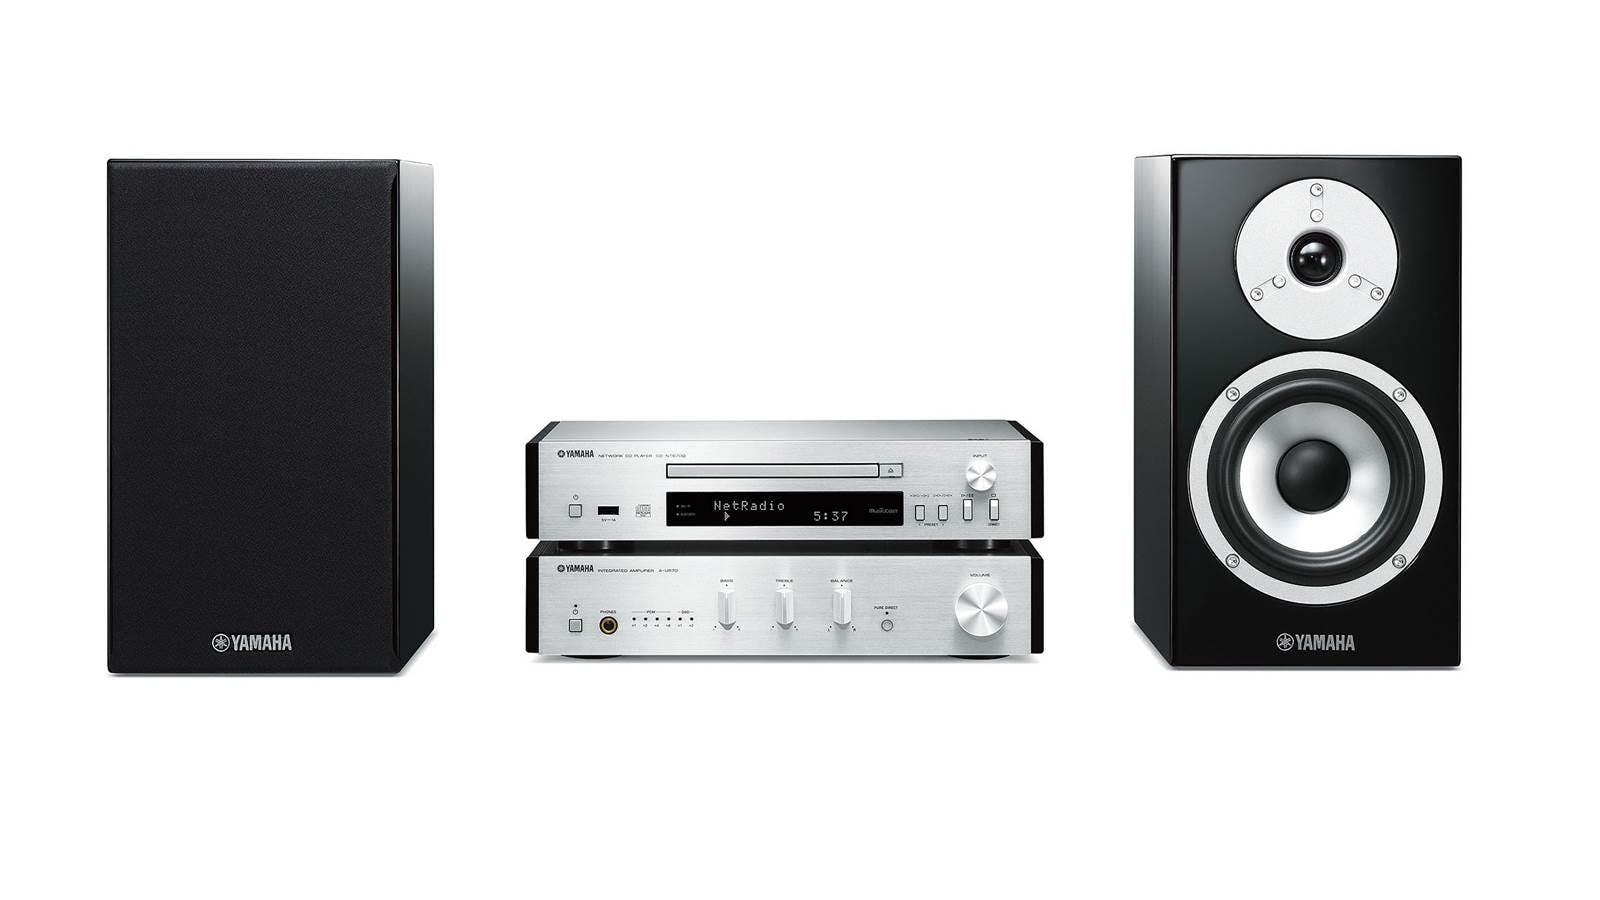 Yamaha musiccast mcr n870 micro hifi harvey norman malaysia for Yamaha sound system